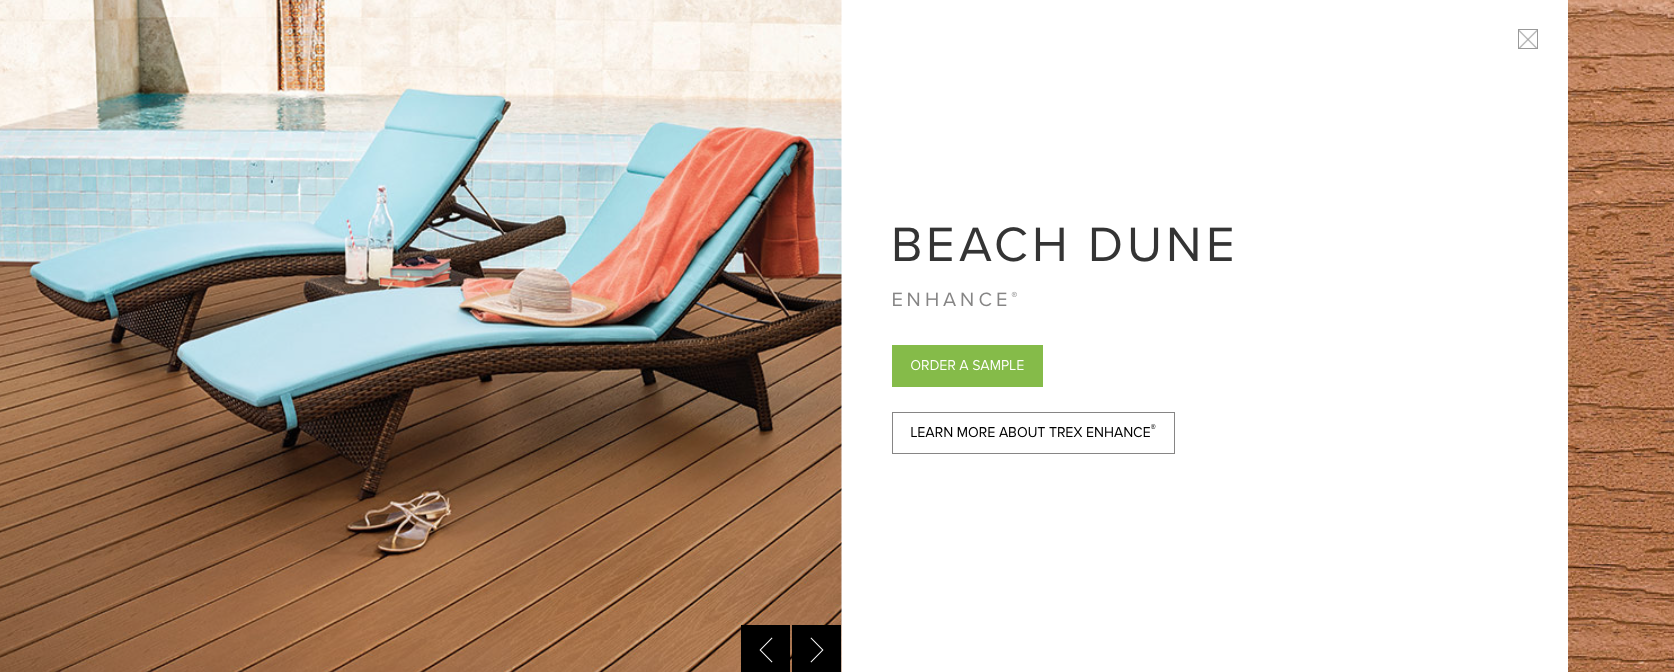 Trex Enhance Beach Dune